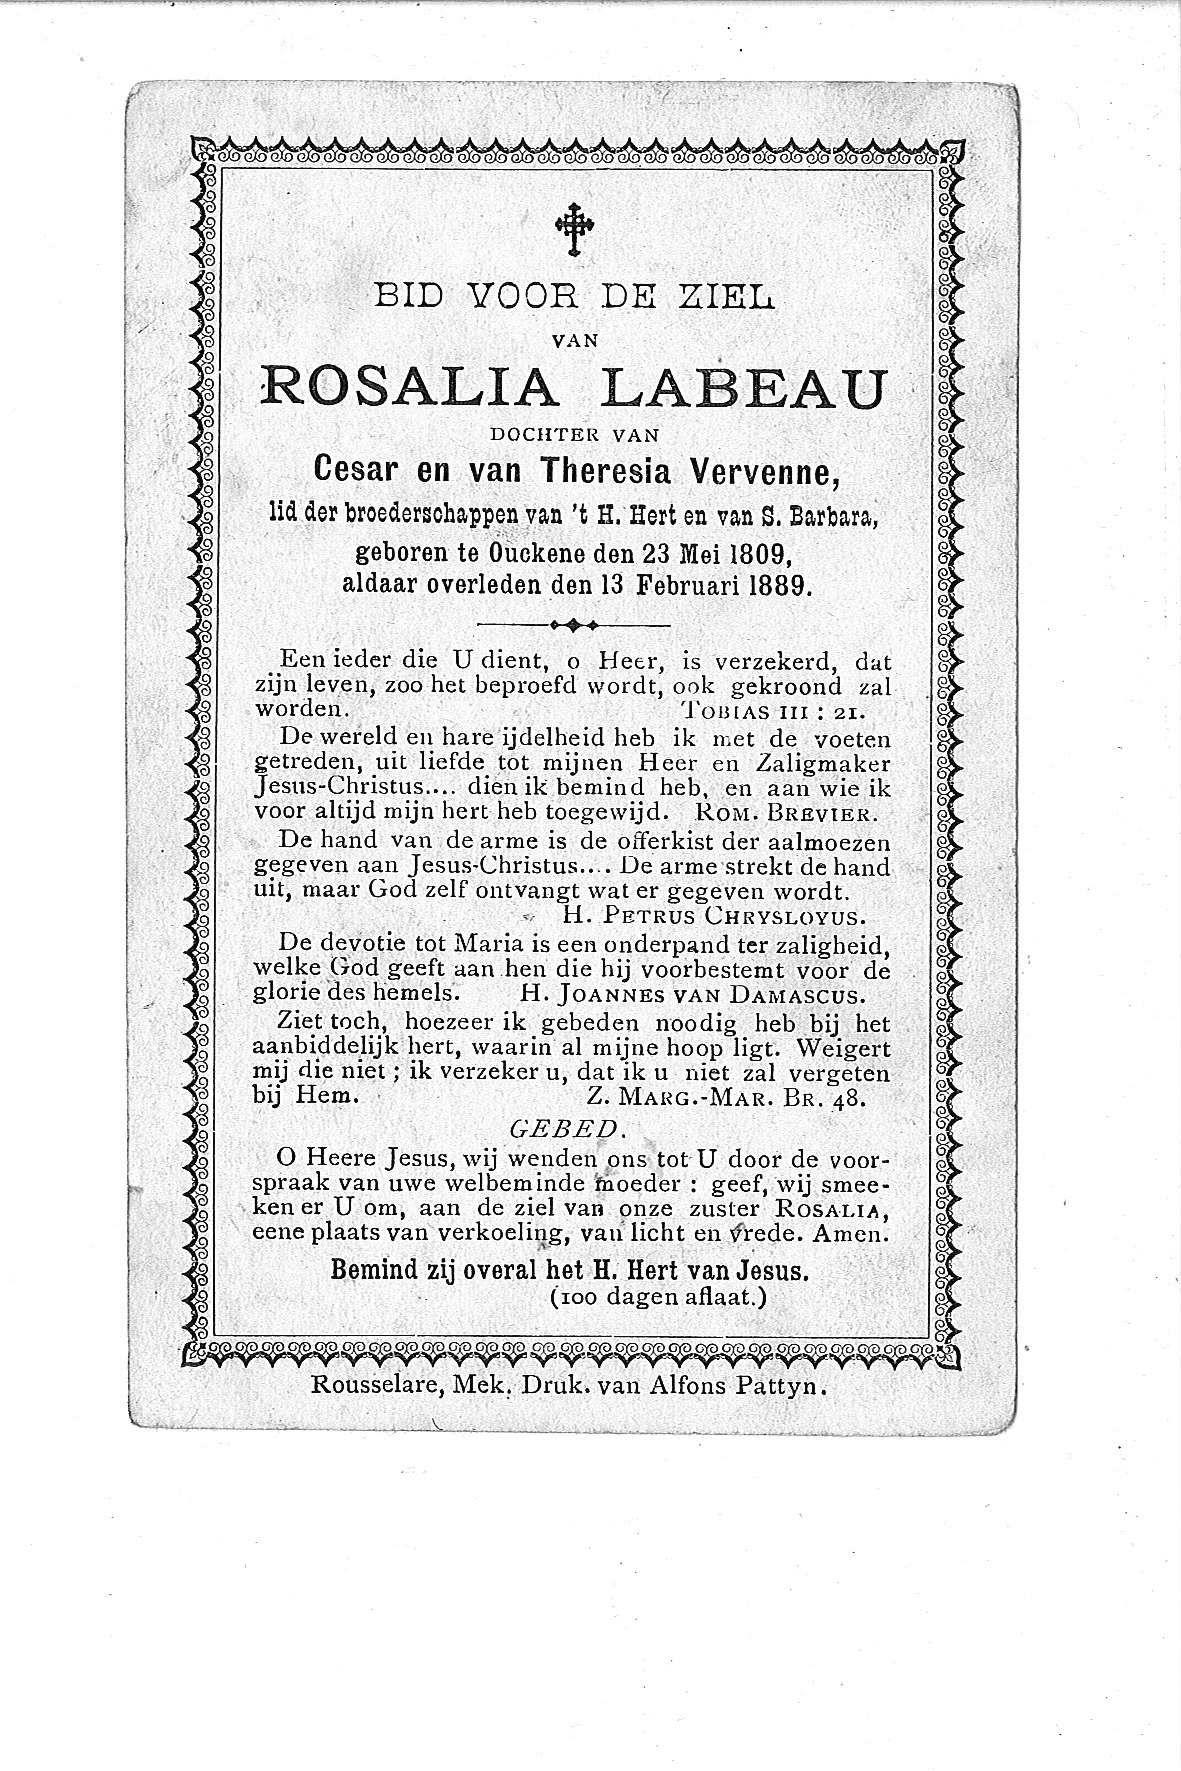 Rosalia(1889)20091211093047_00027.jpg